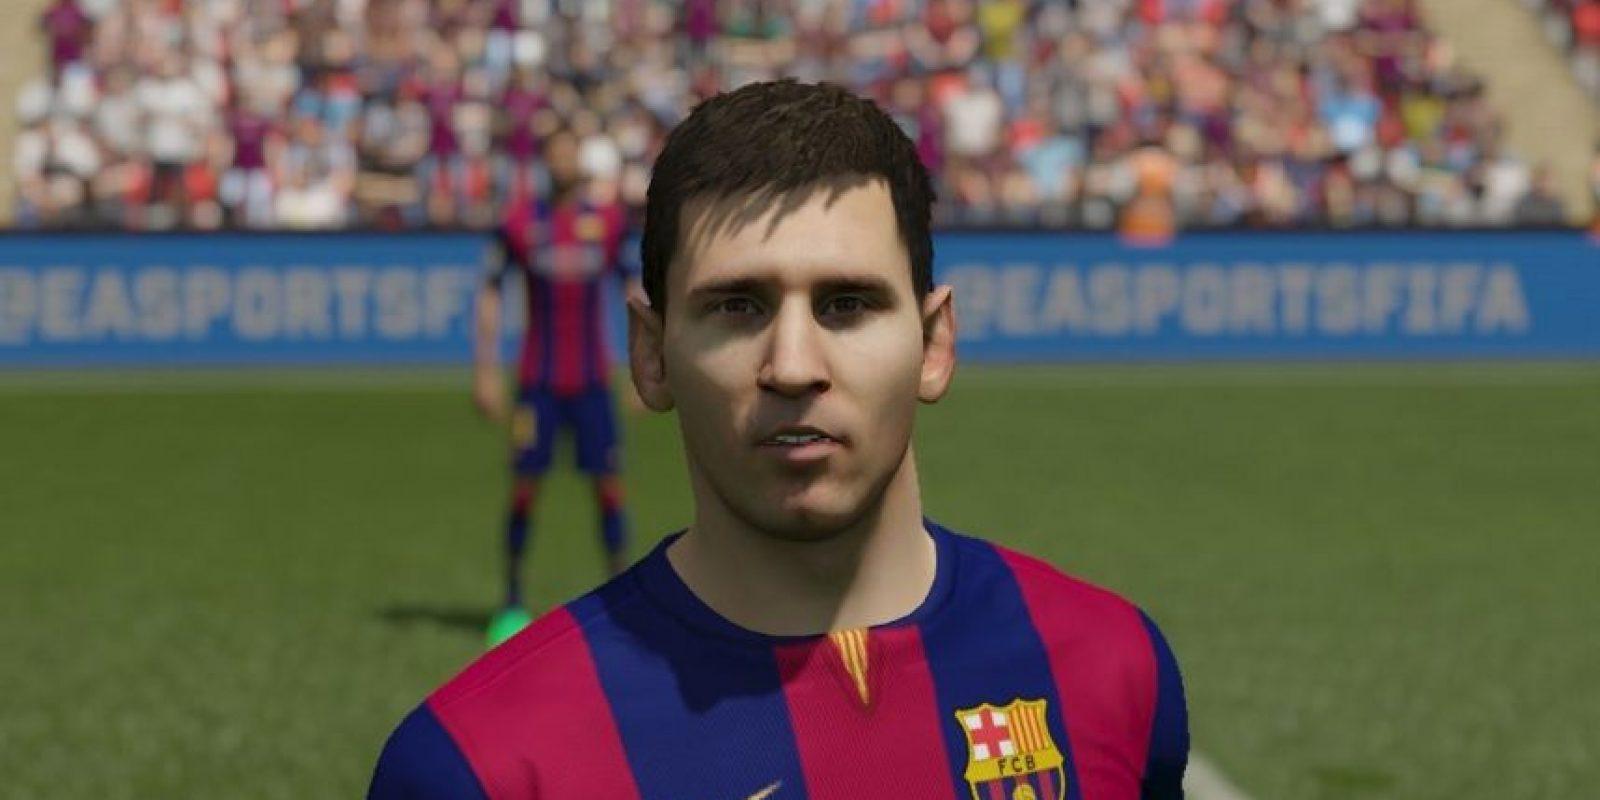 FIFA 15 Foto:Tumblr